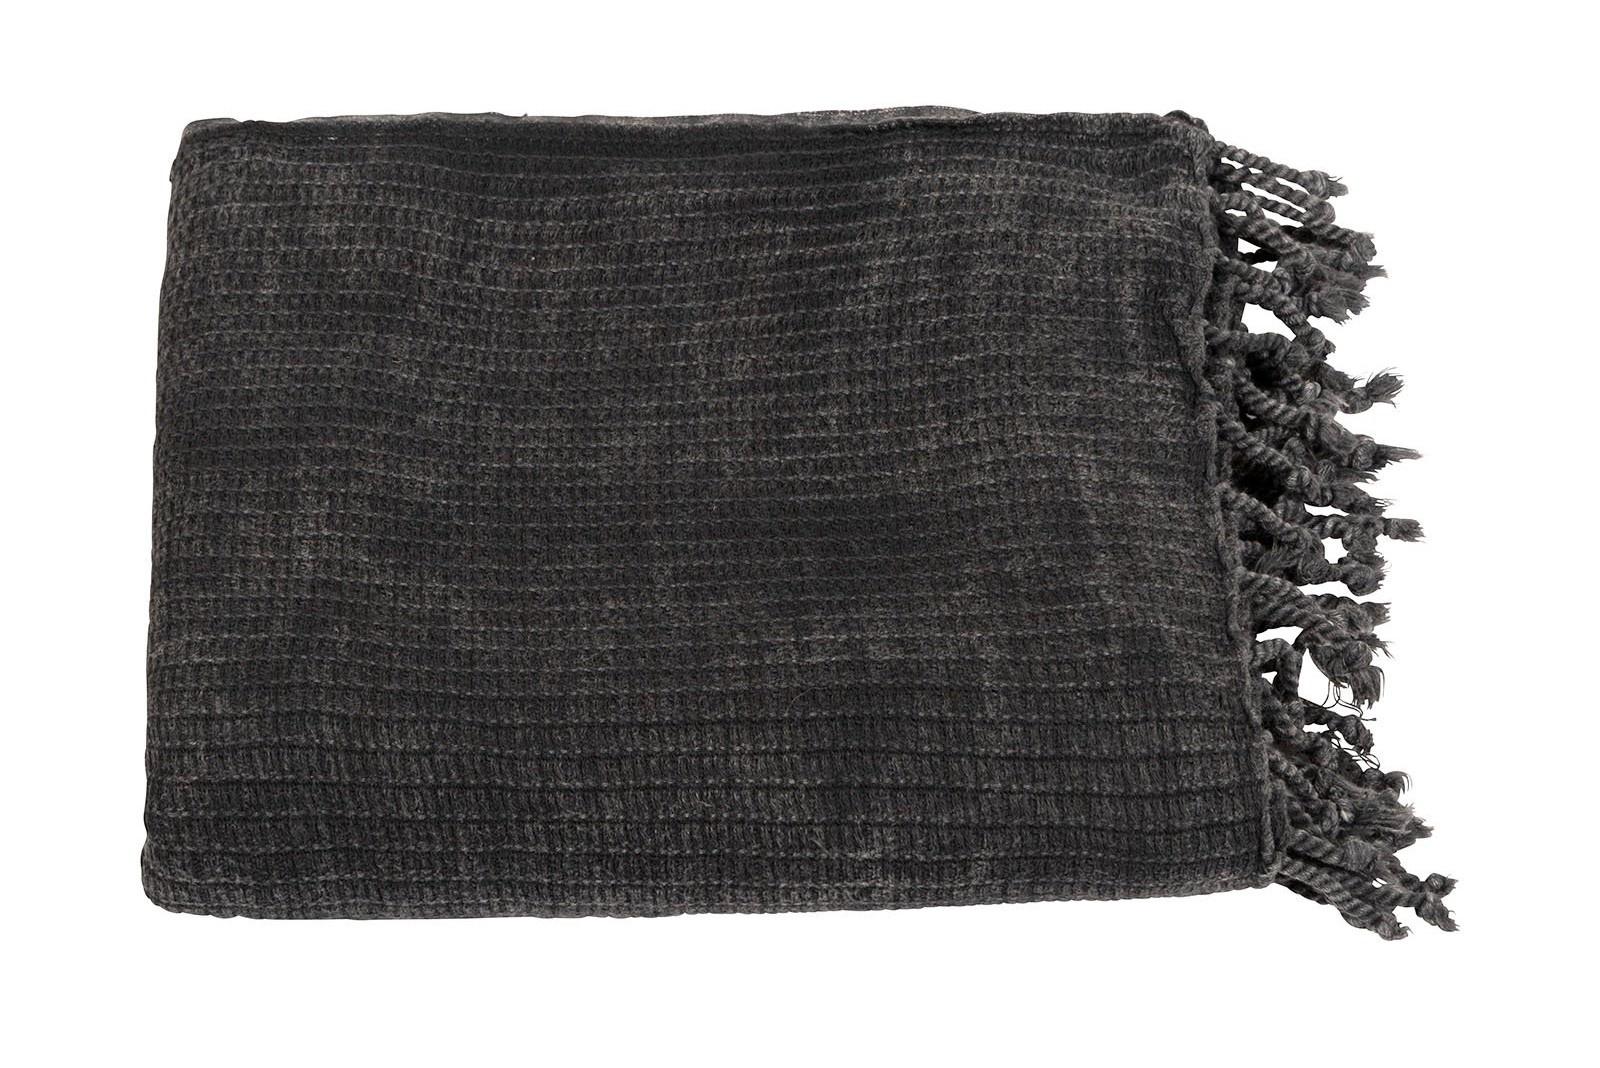 Handdoek hamam towel dark grey/blue-4